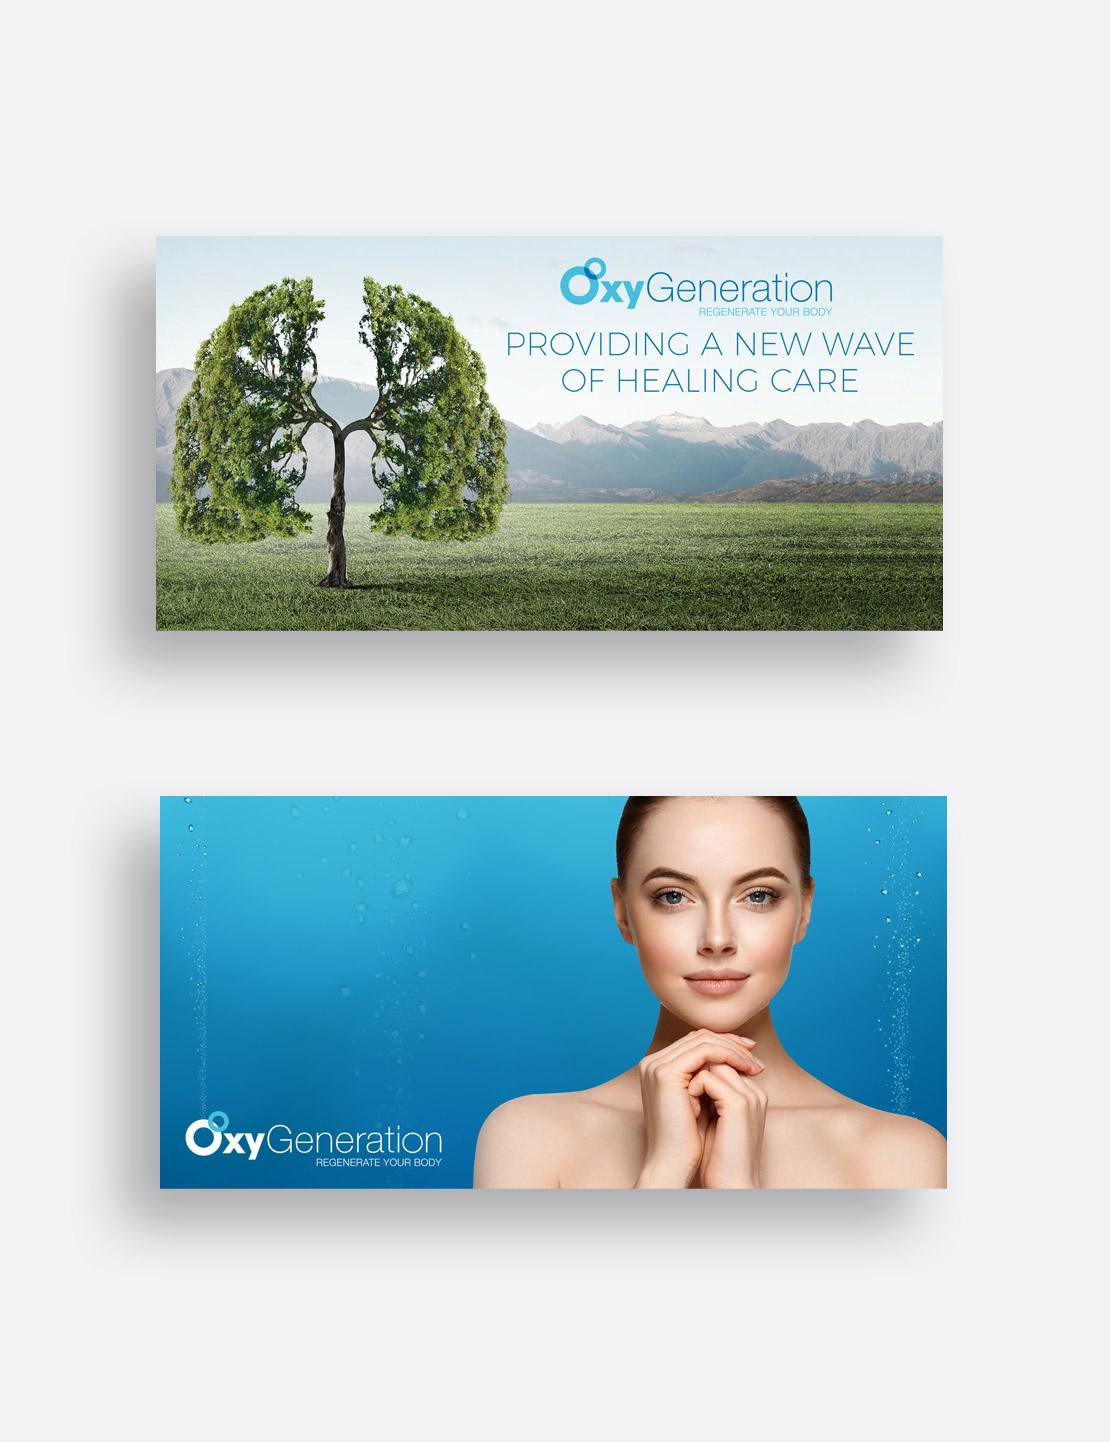 OxyGeneration Social media Assets